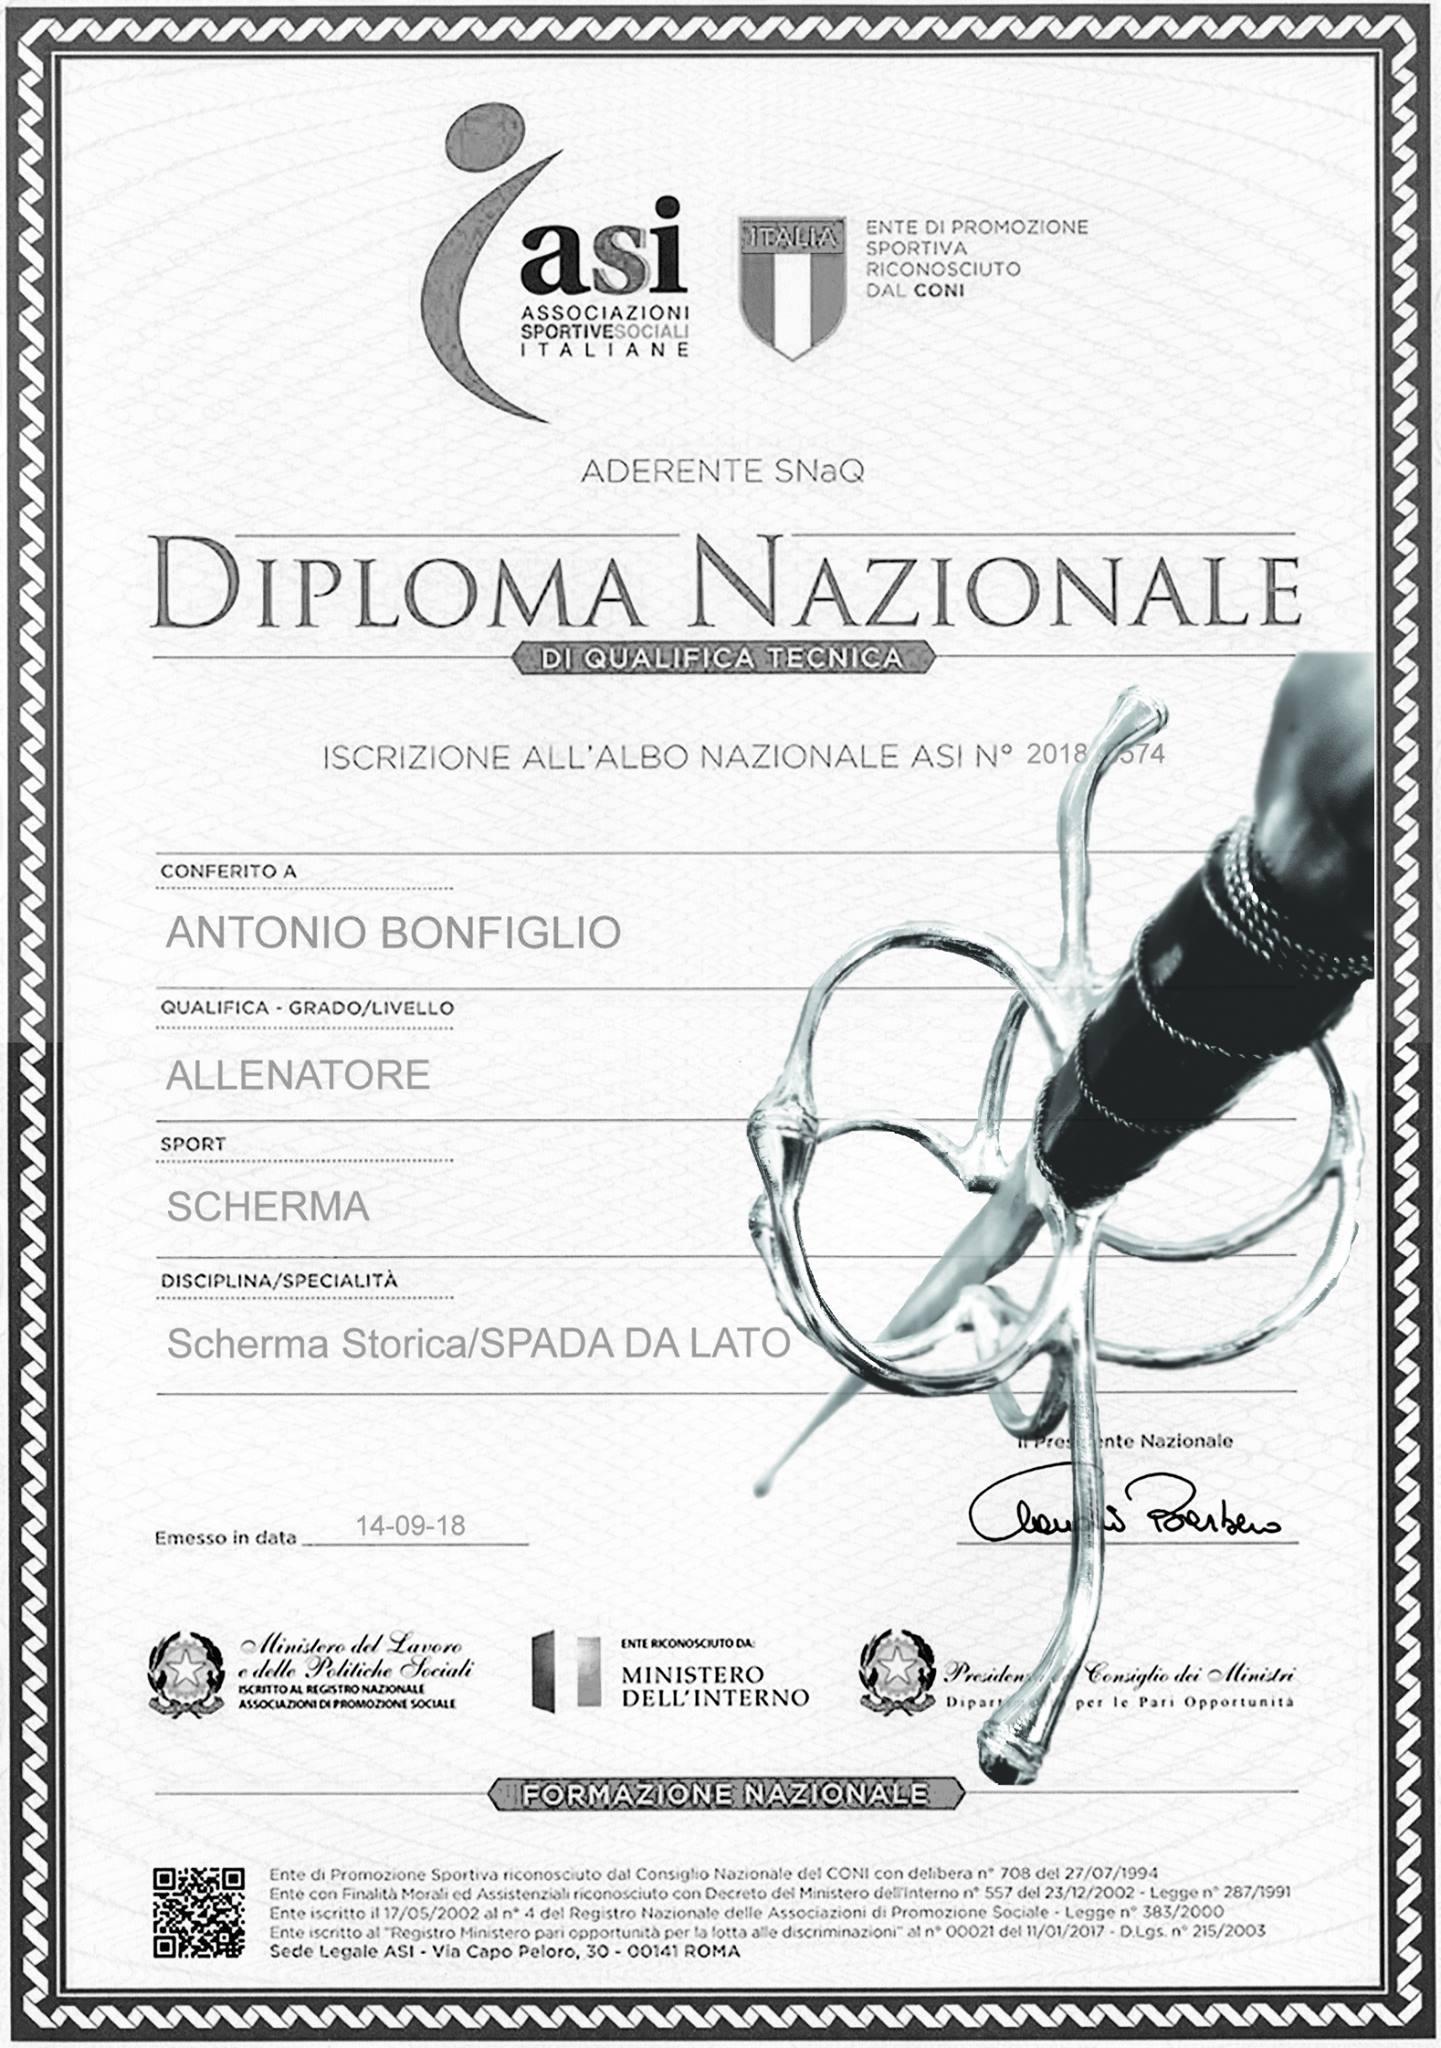 8 ott 18 - Consegna diploma Antonio Bonfiglio - Ars Gladii 06